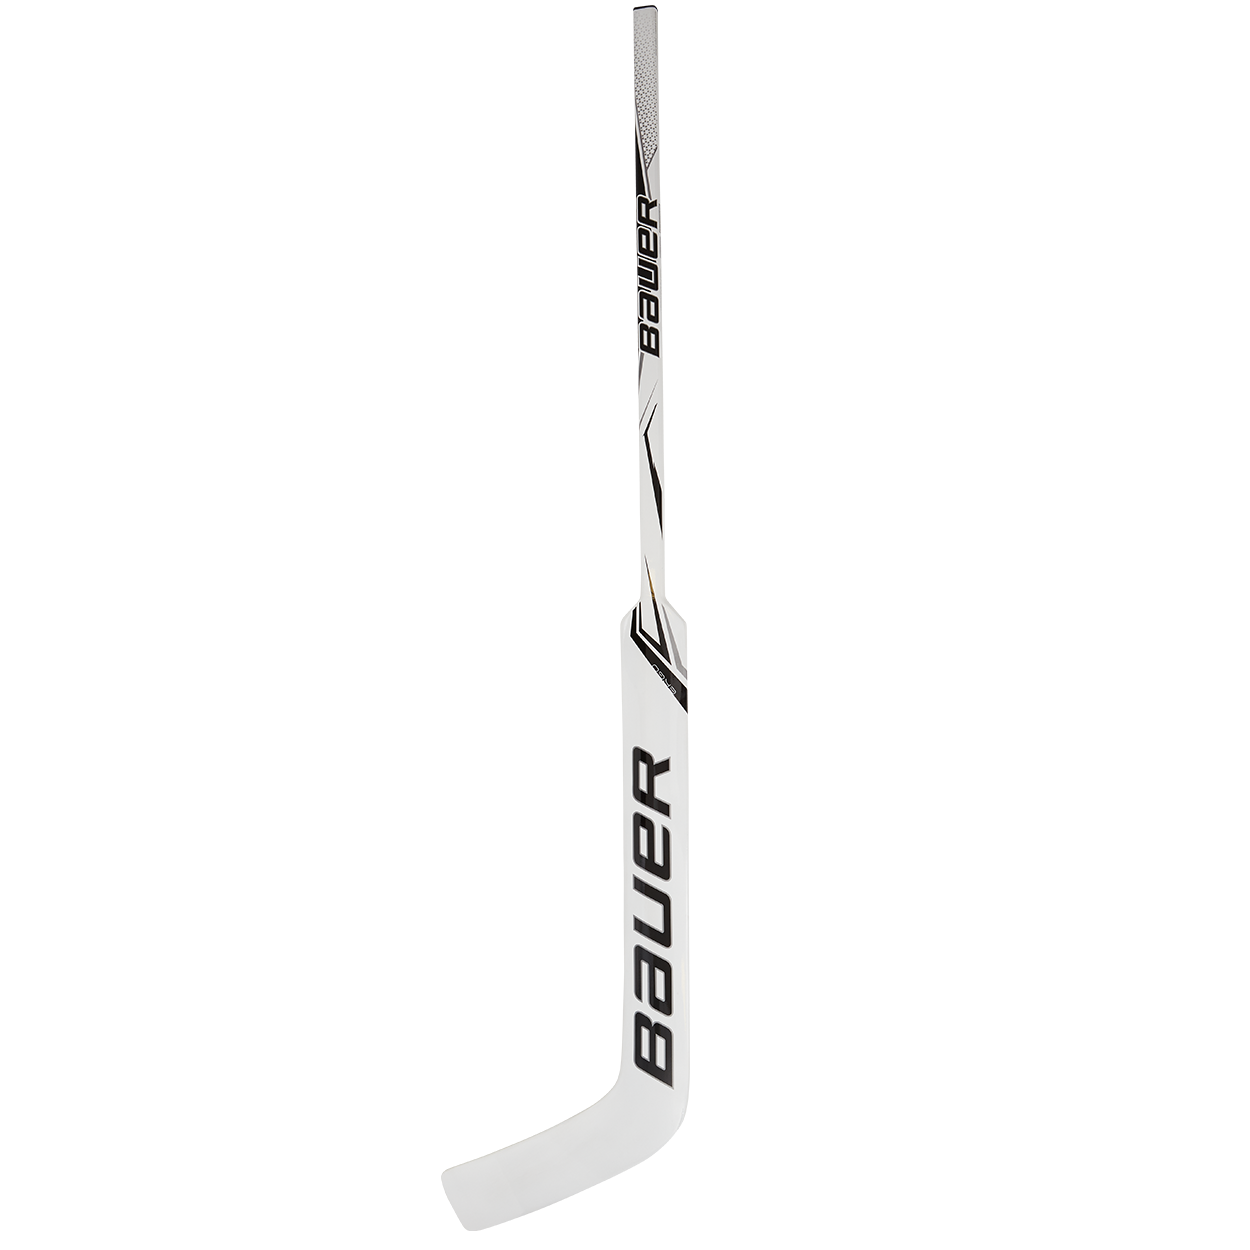 GSX PRODIGY Goal Stick,,Medium